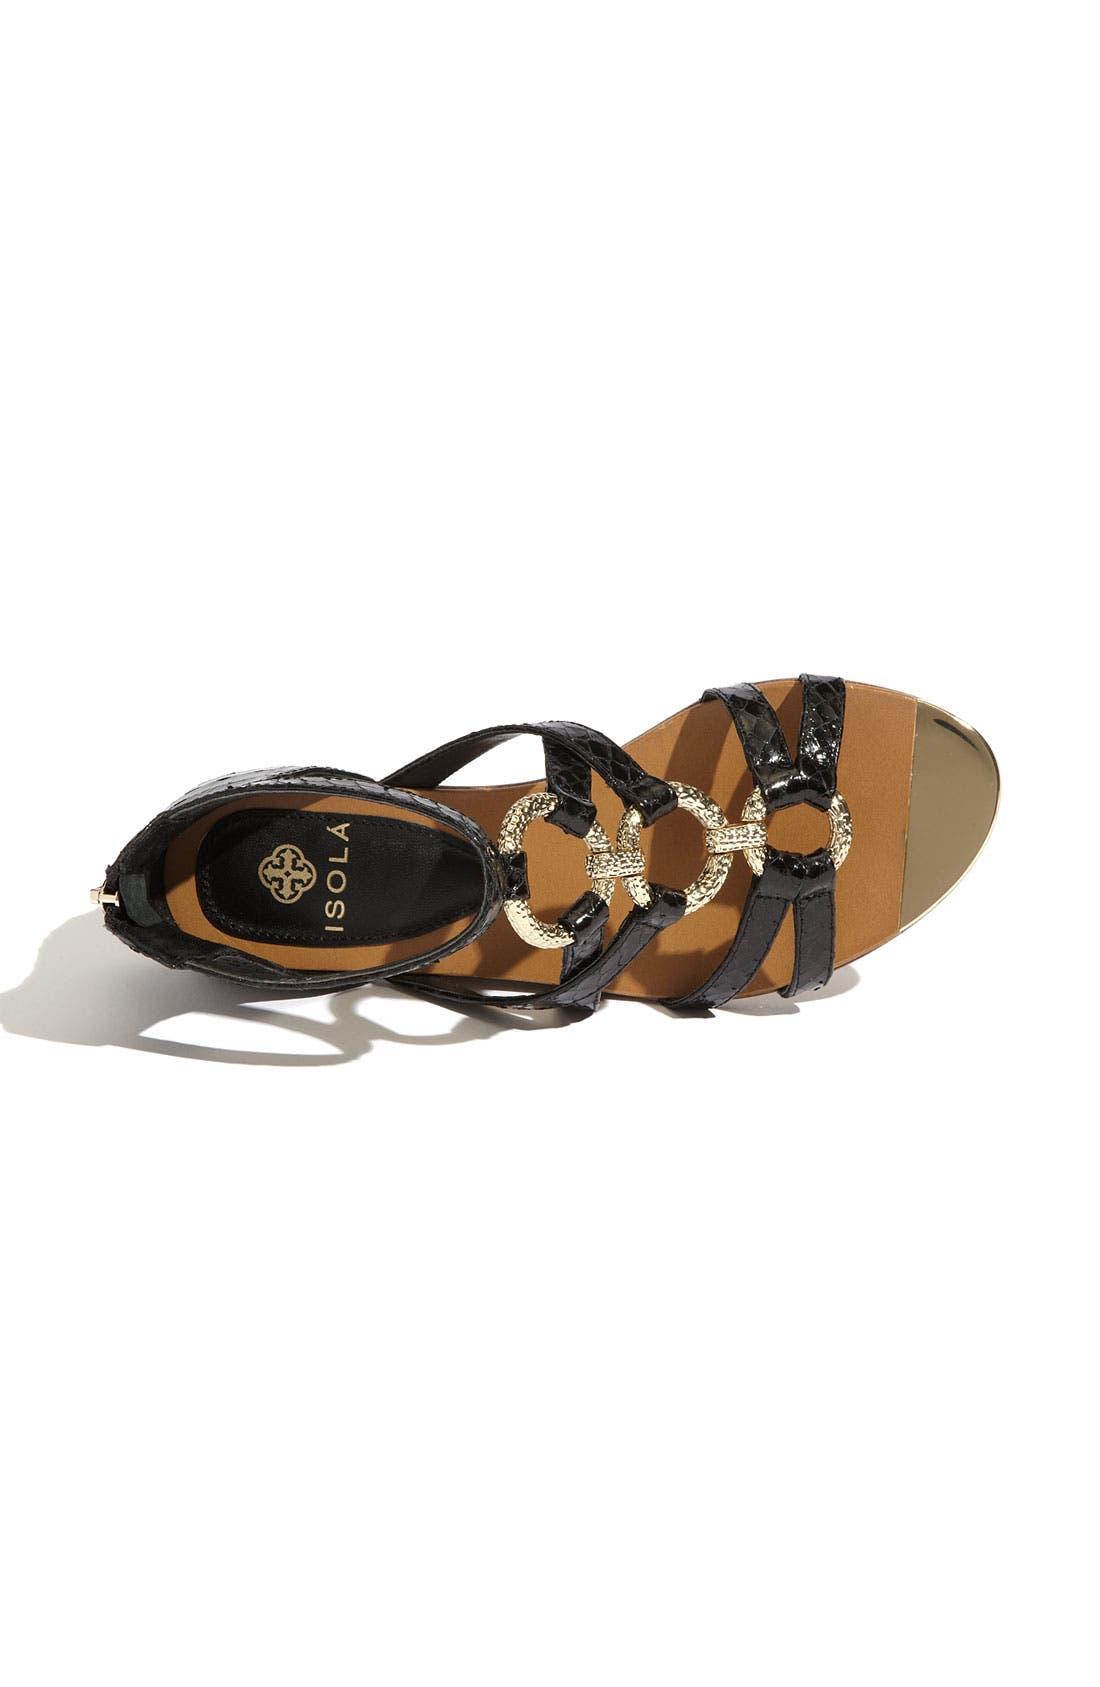 'Adriel' Flat Sandal,                             Alternate thumbnail 2, color,                             001